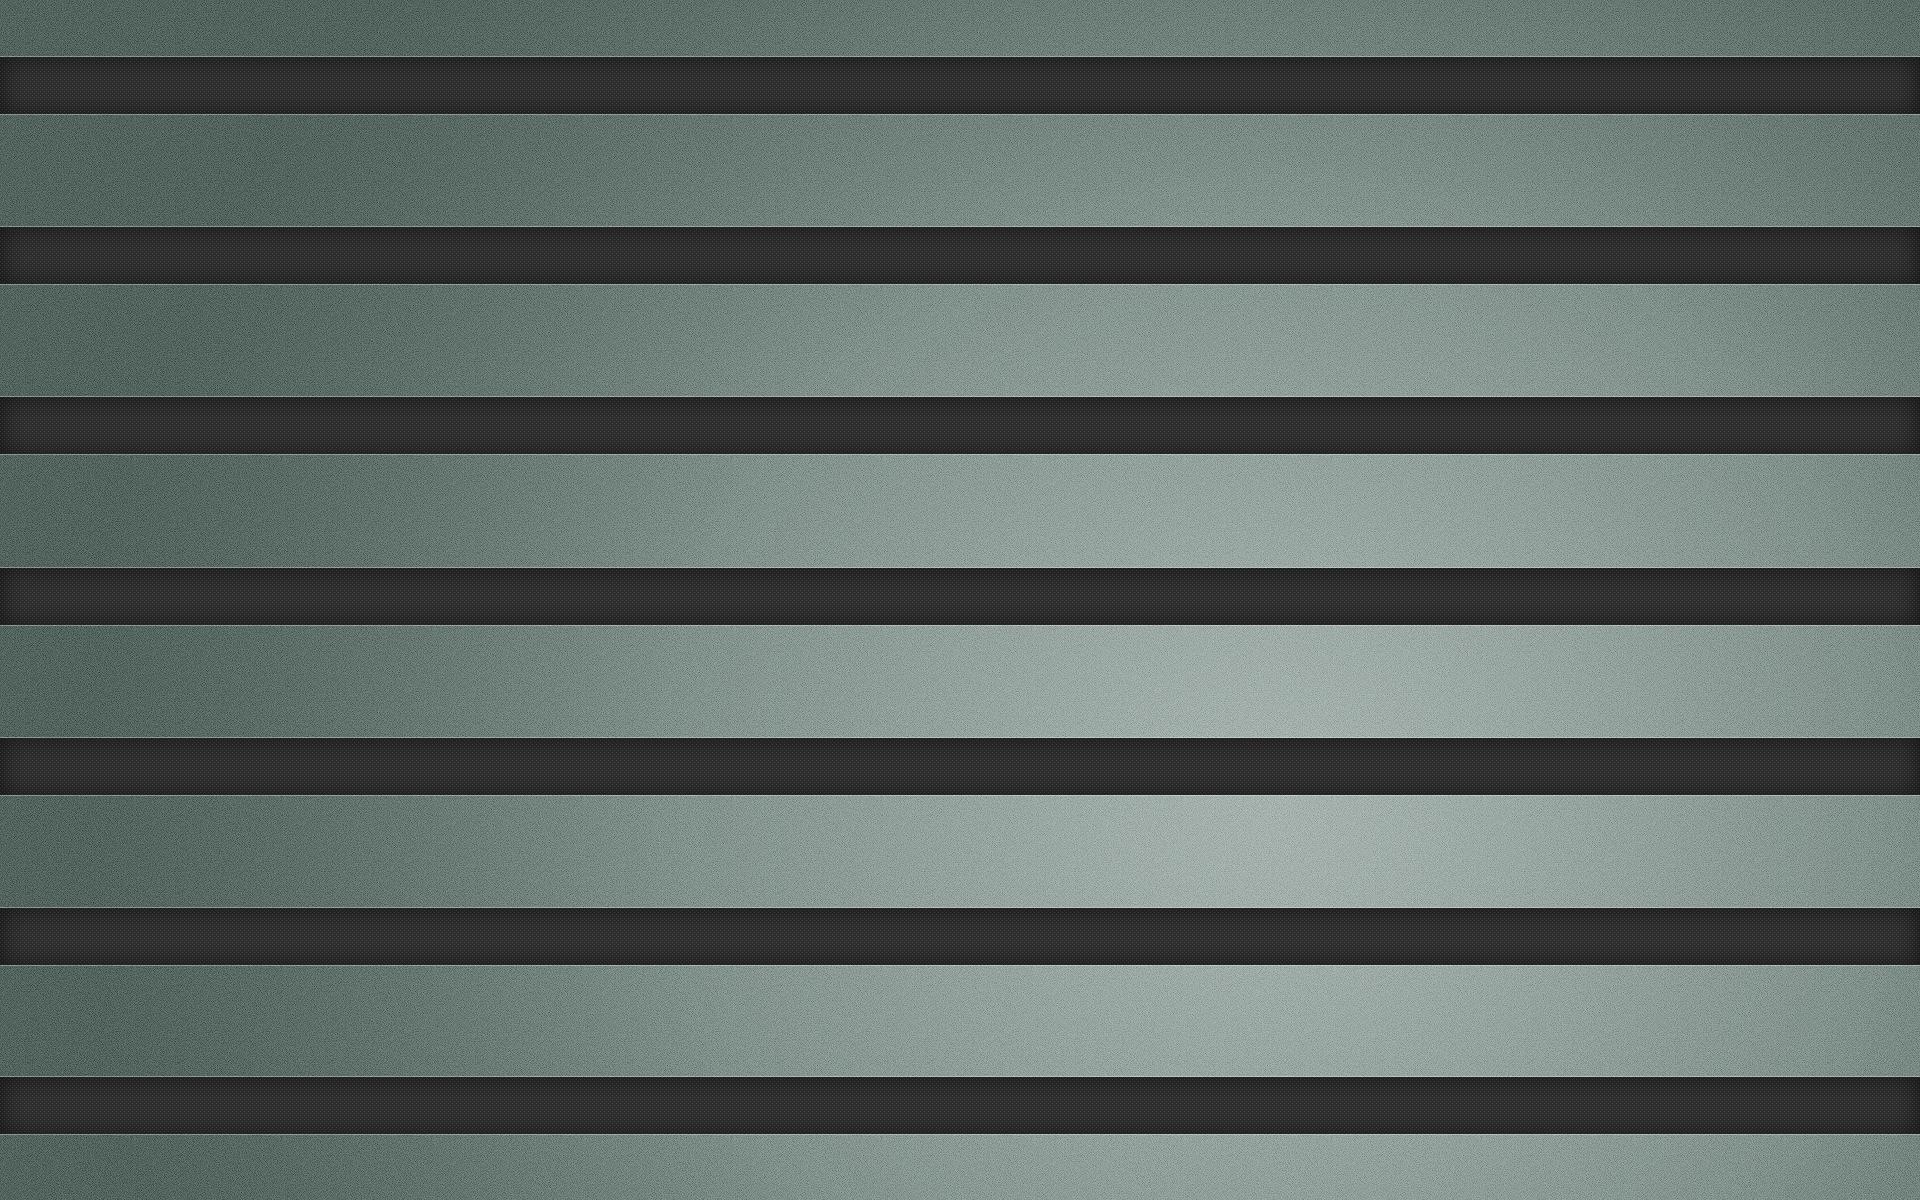 Grey Horizontal Stripes Background Horizontal str 1920x1200